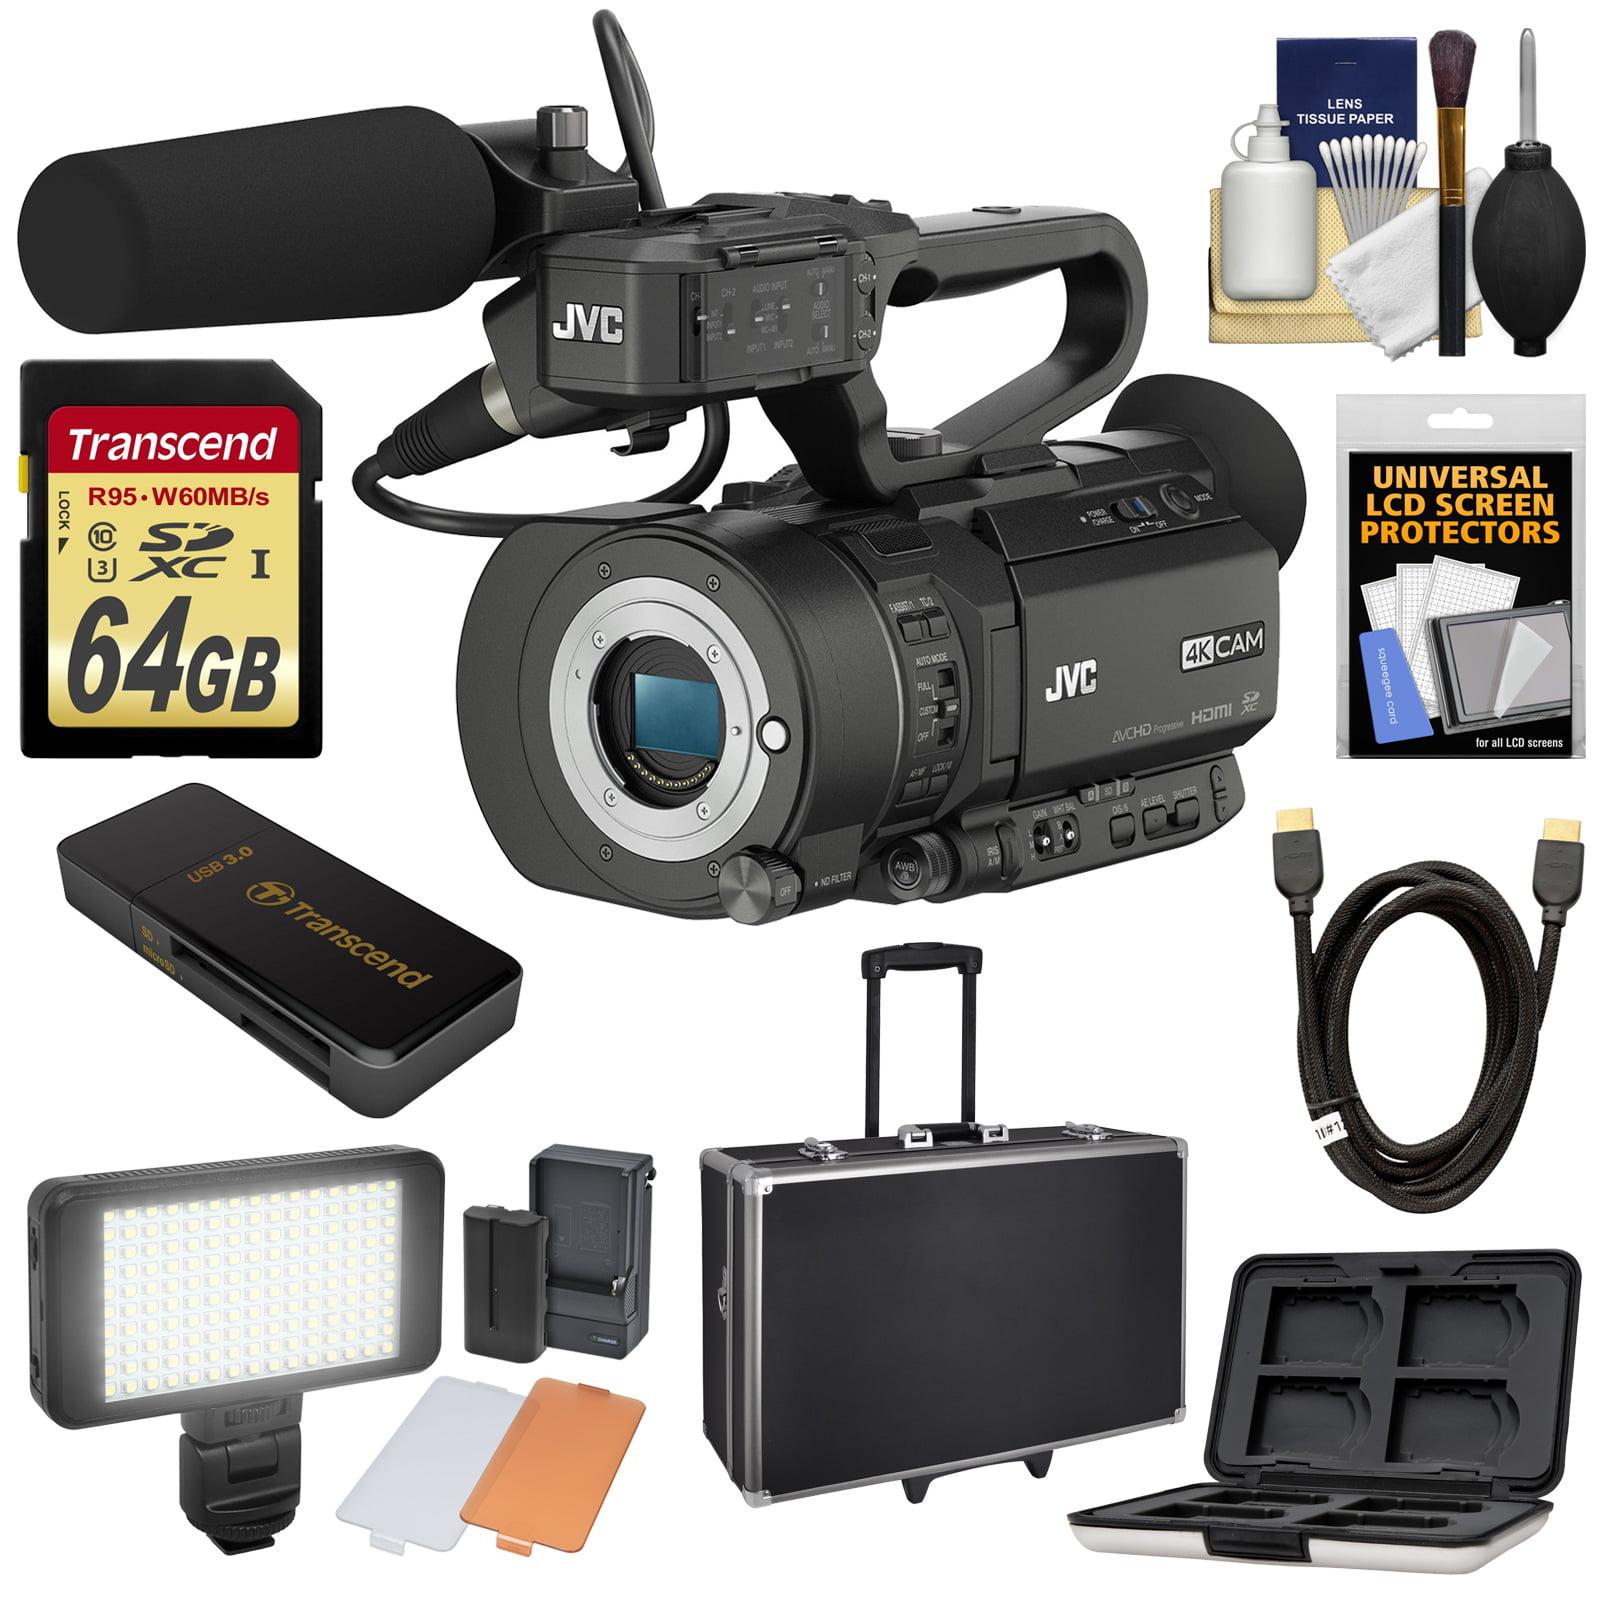 JVC GY-LS300CHU Ultra 4K HD 4KCAM Super 35 Pro Camcorder ...